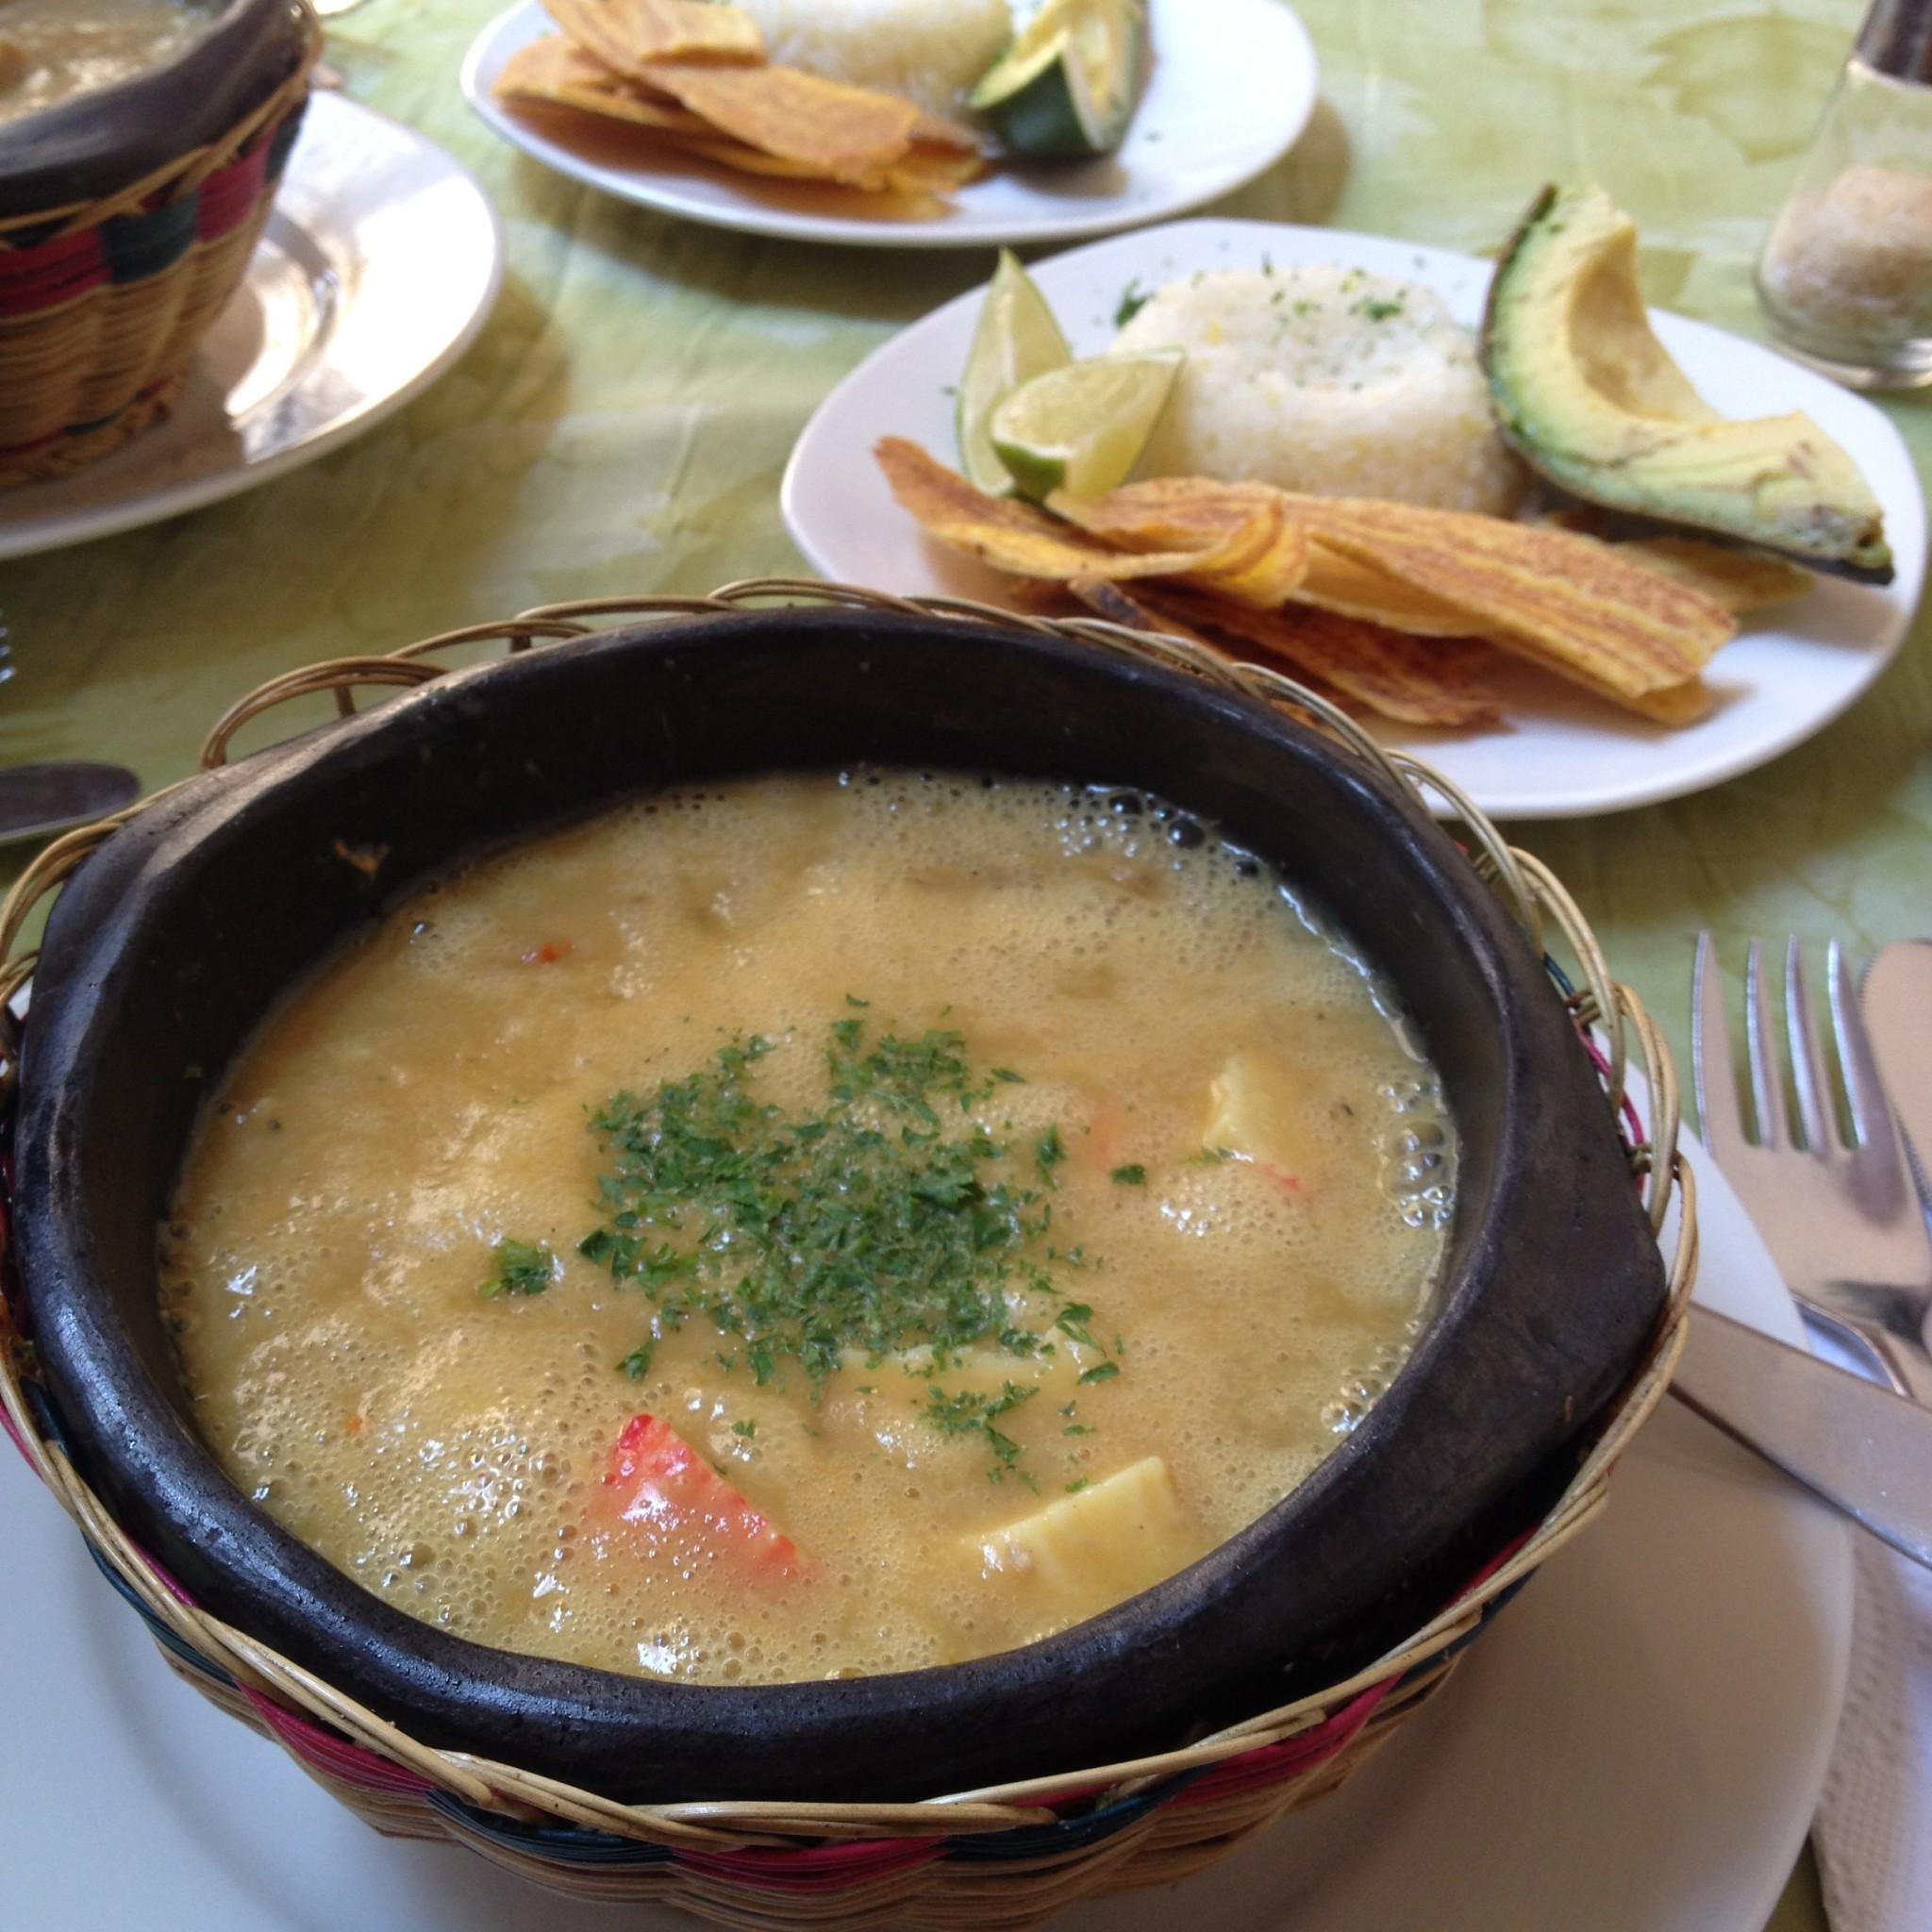 Mittagsmenüs im Pimienta y Cafe